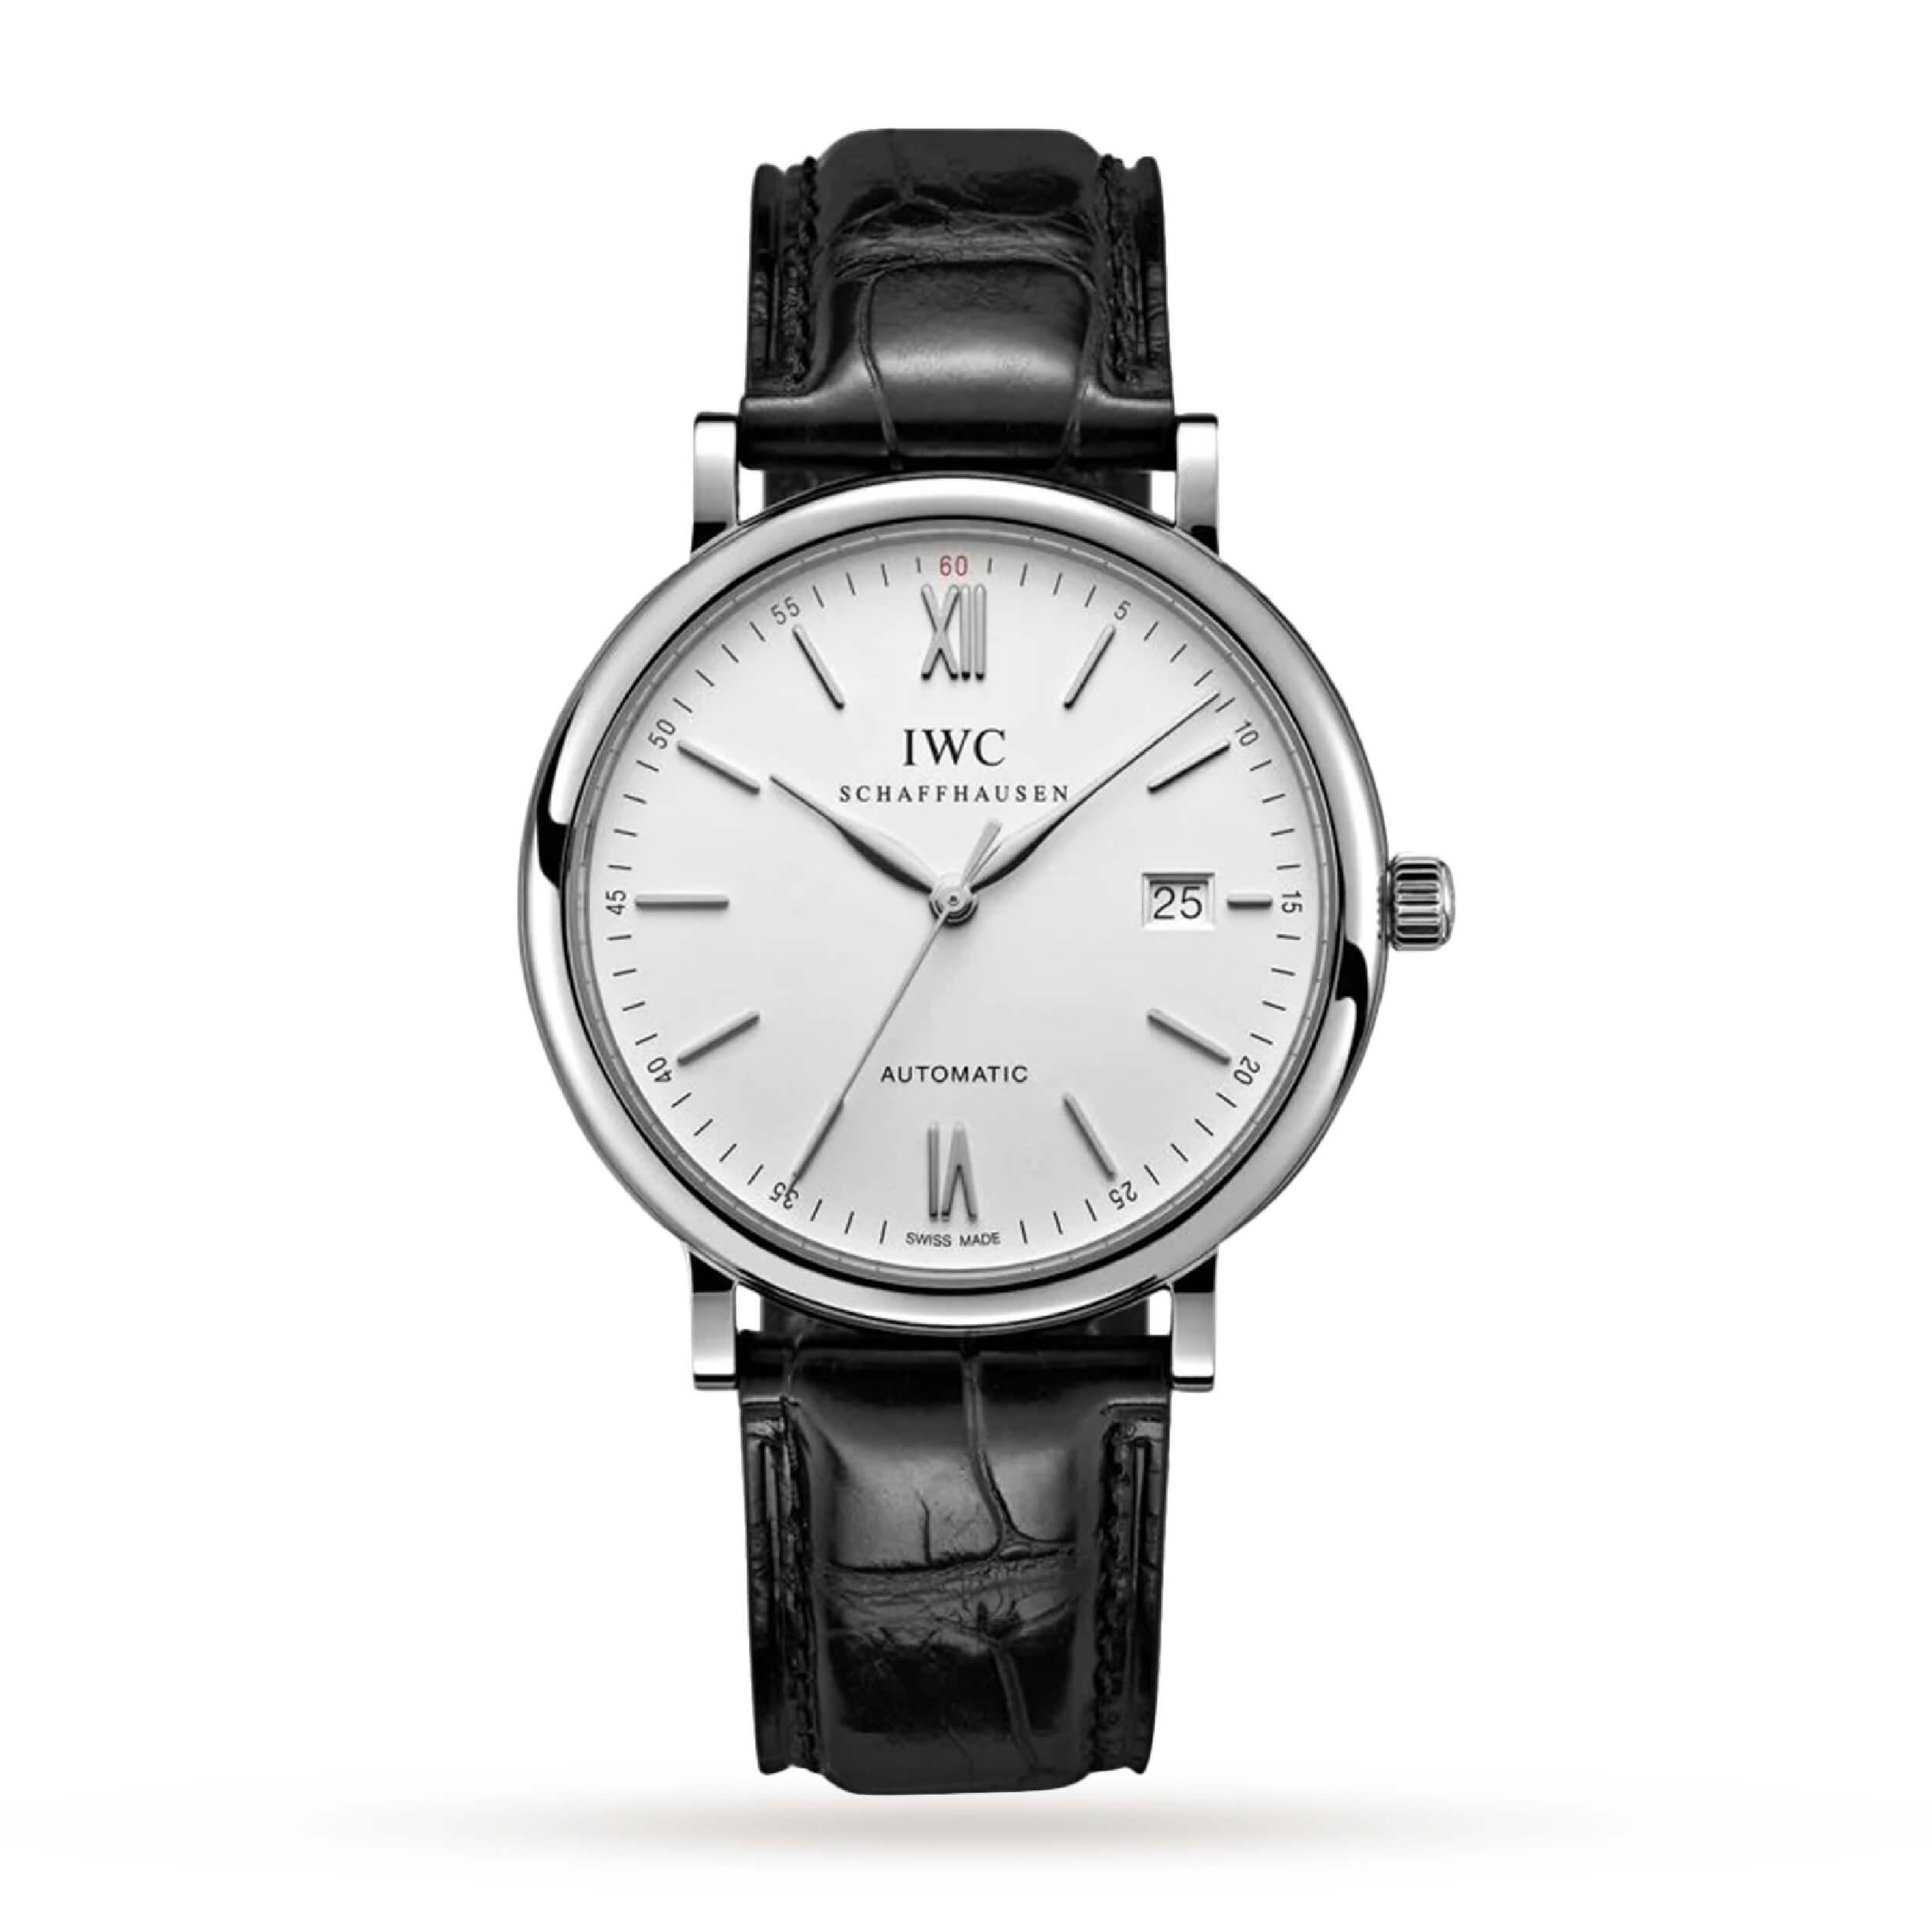 IWC Portofino | Wristwatches360